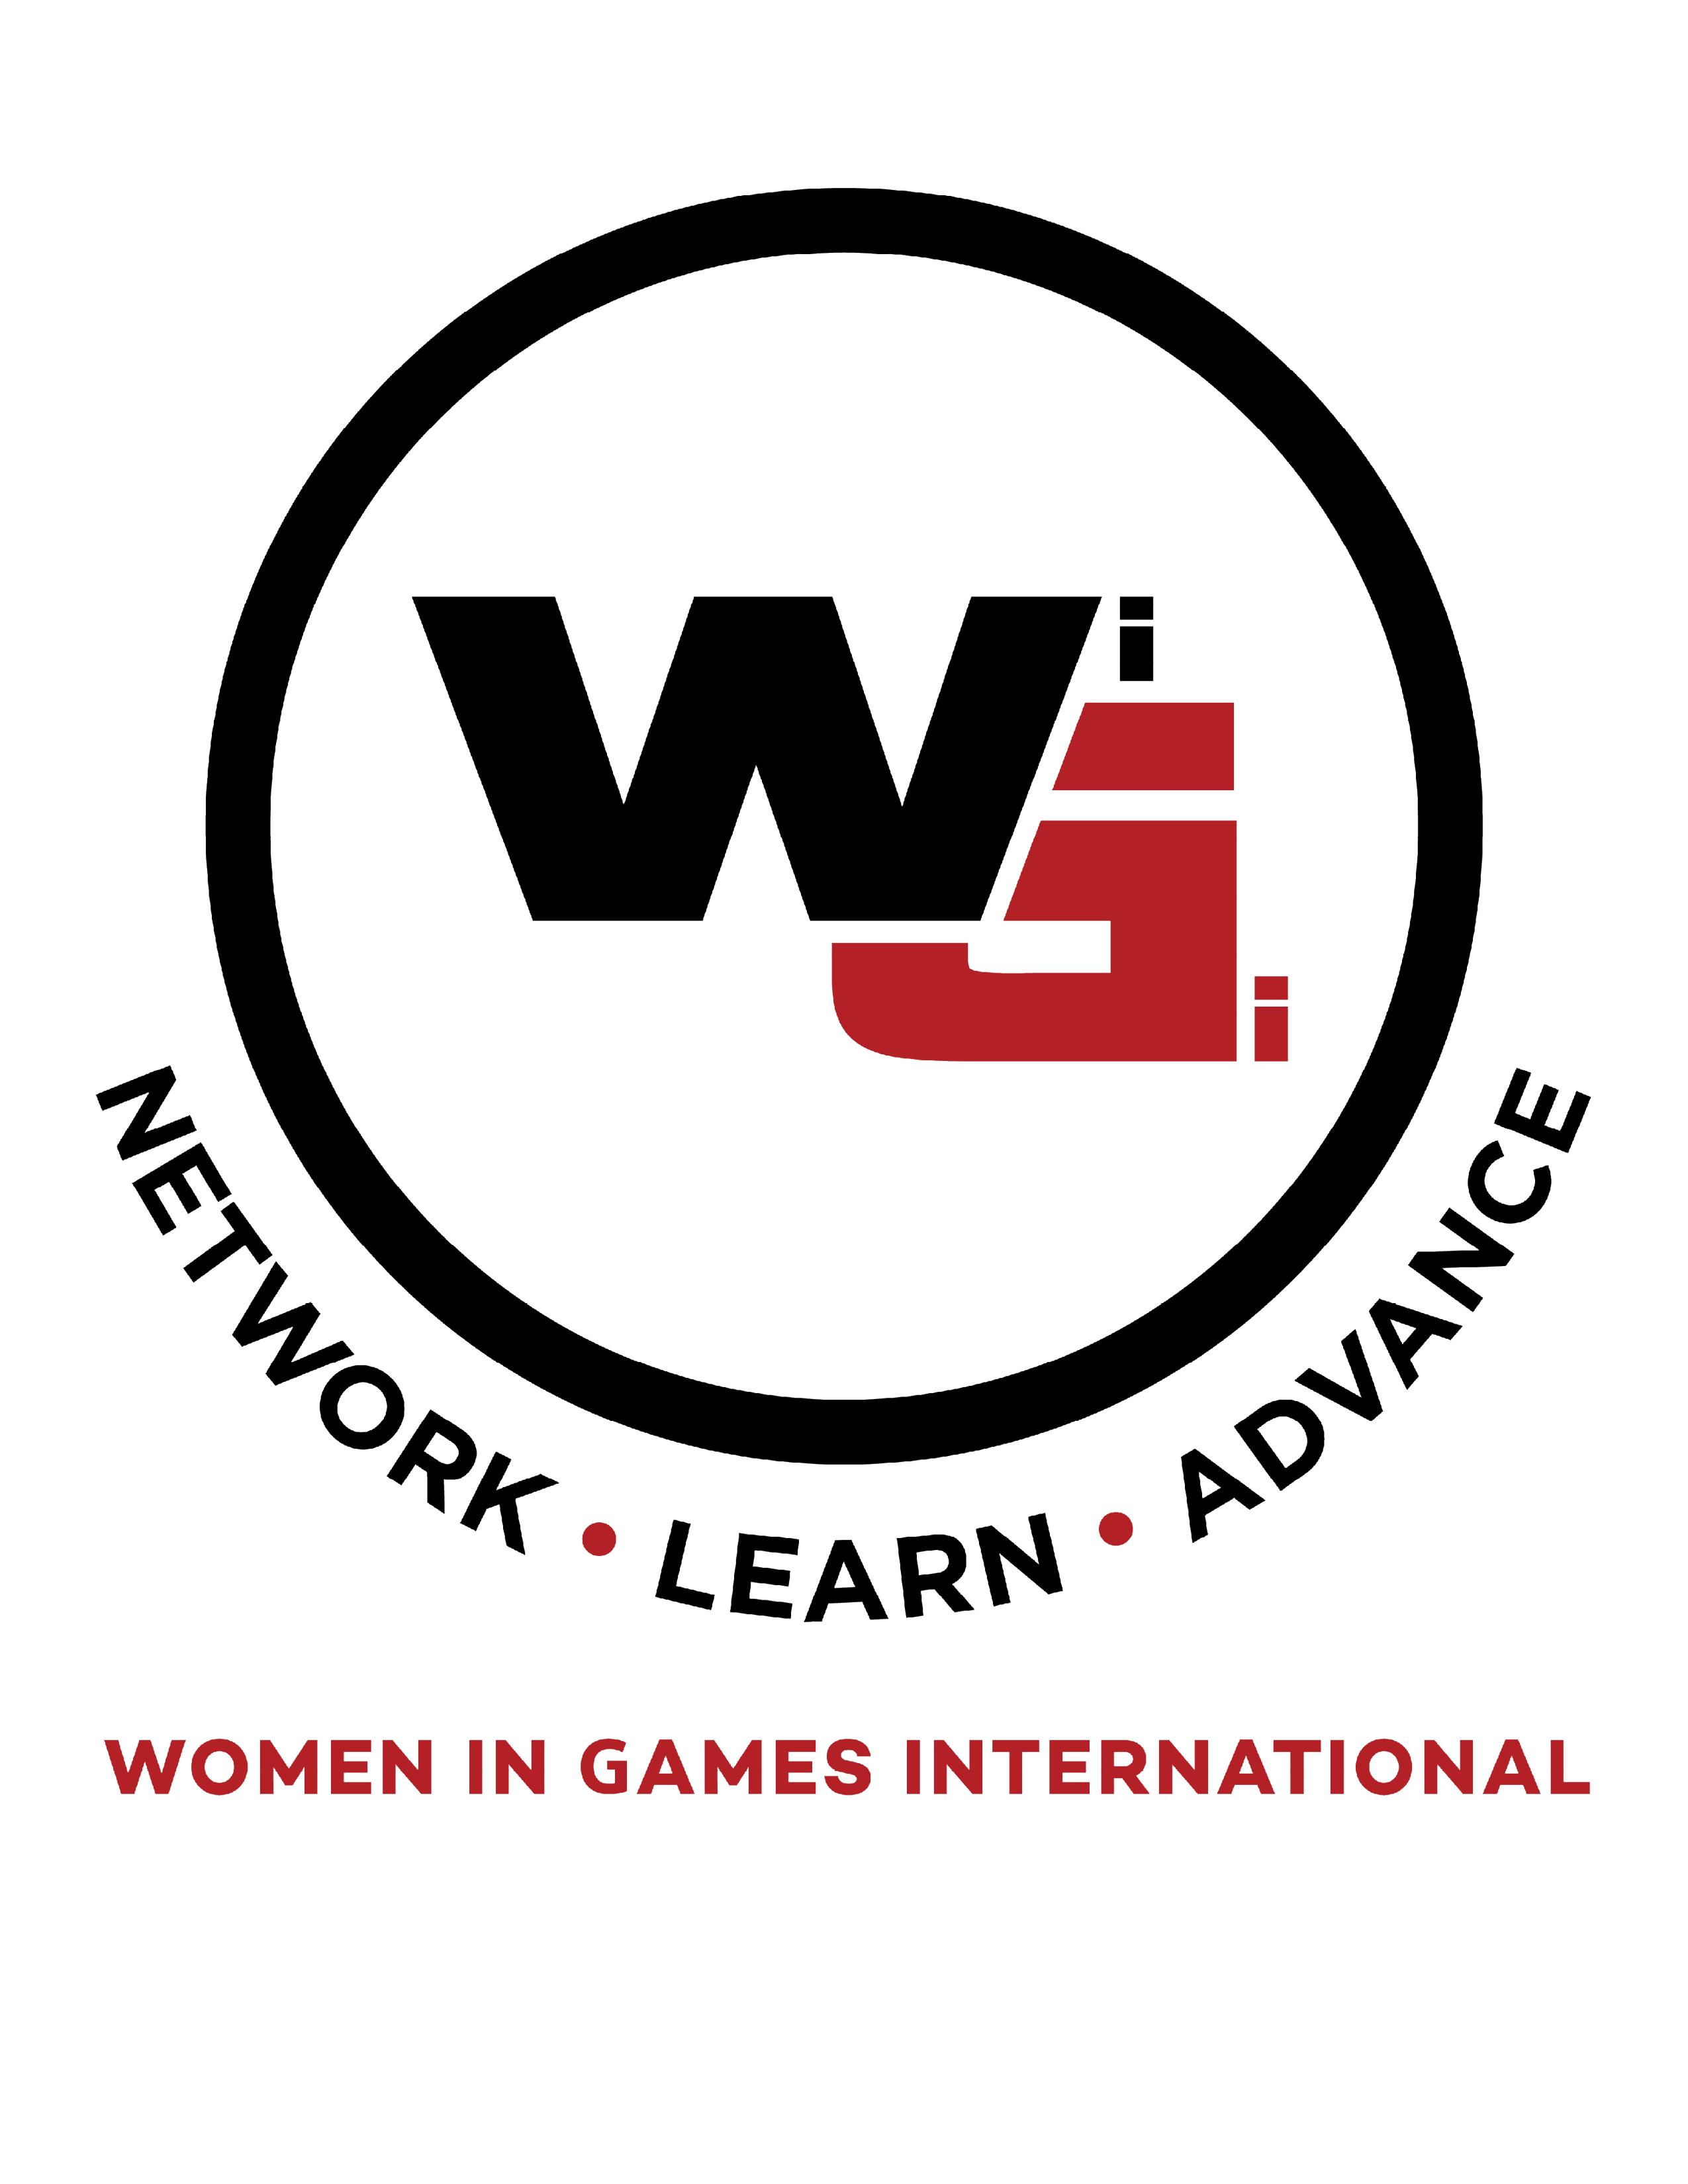 Women in Games International logo